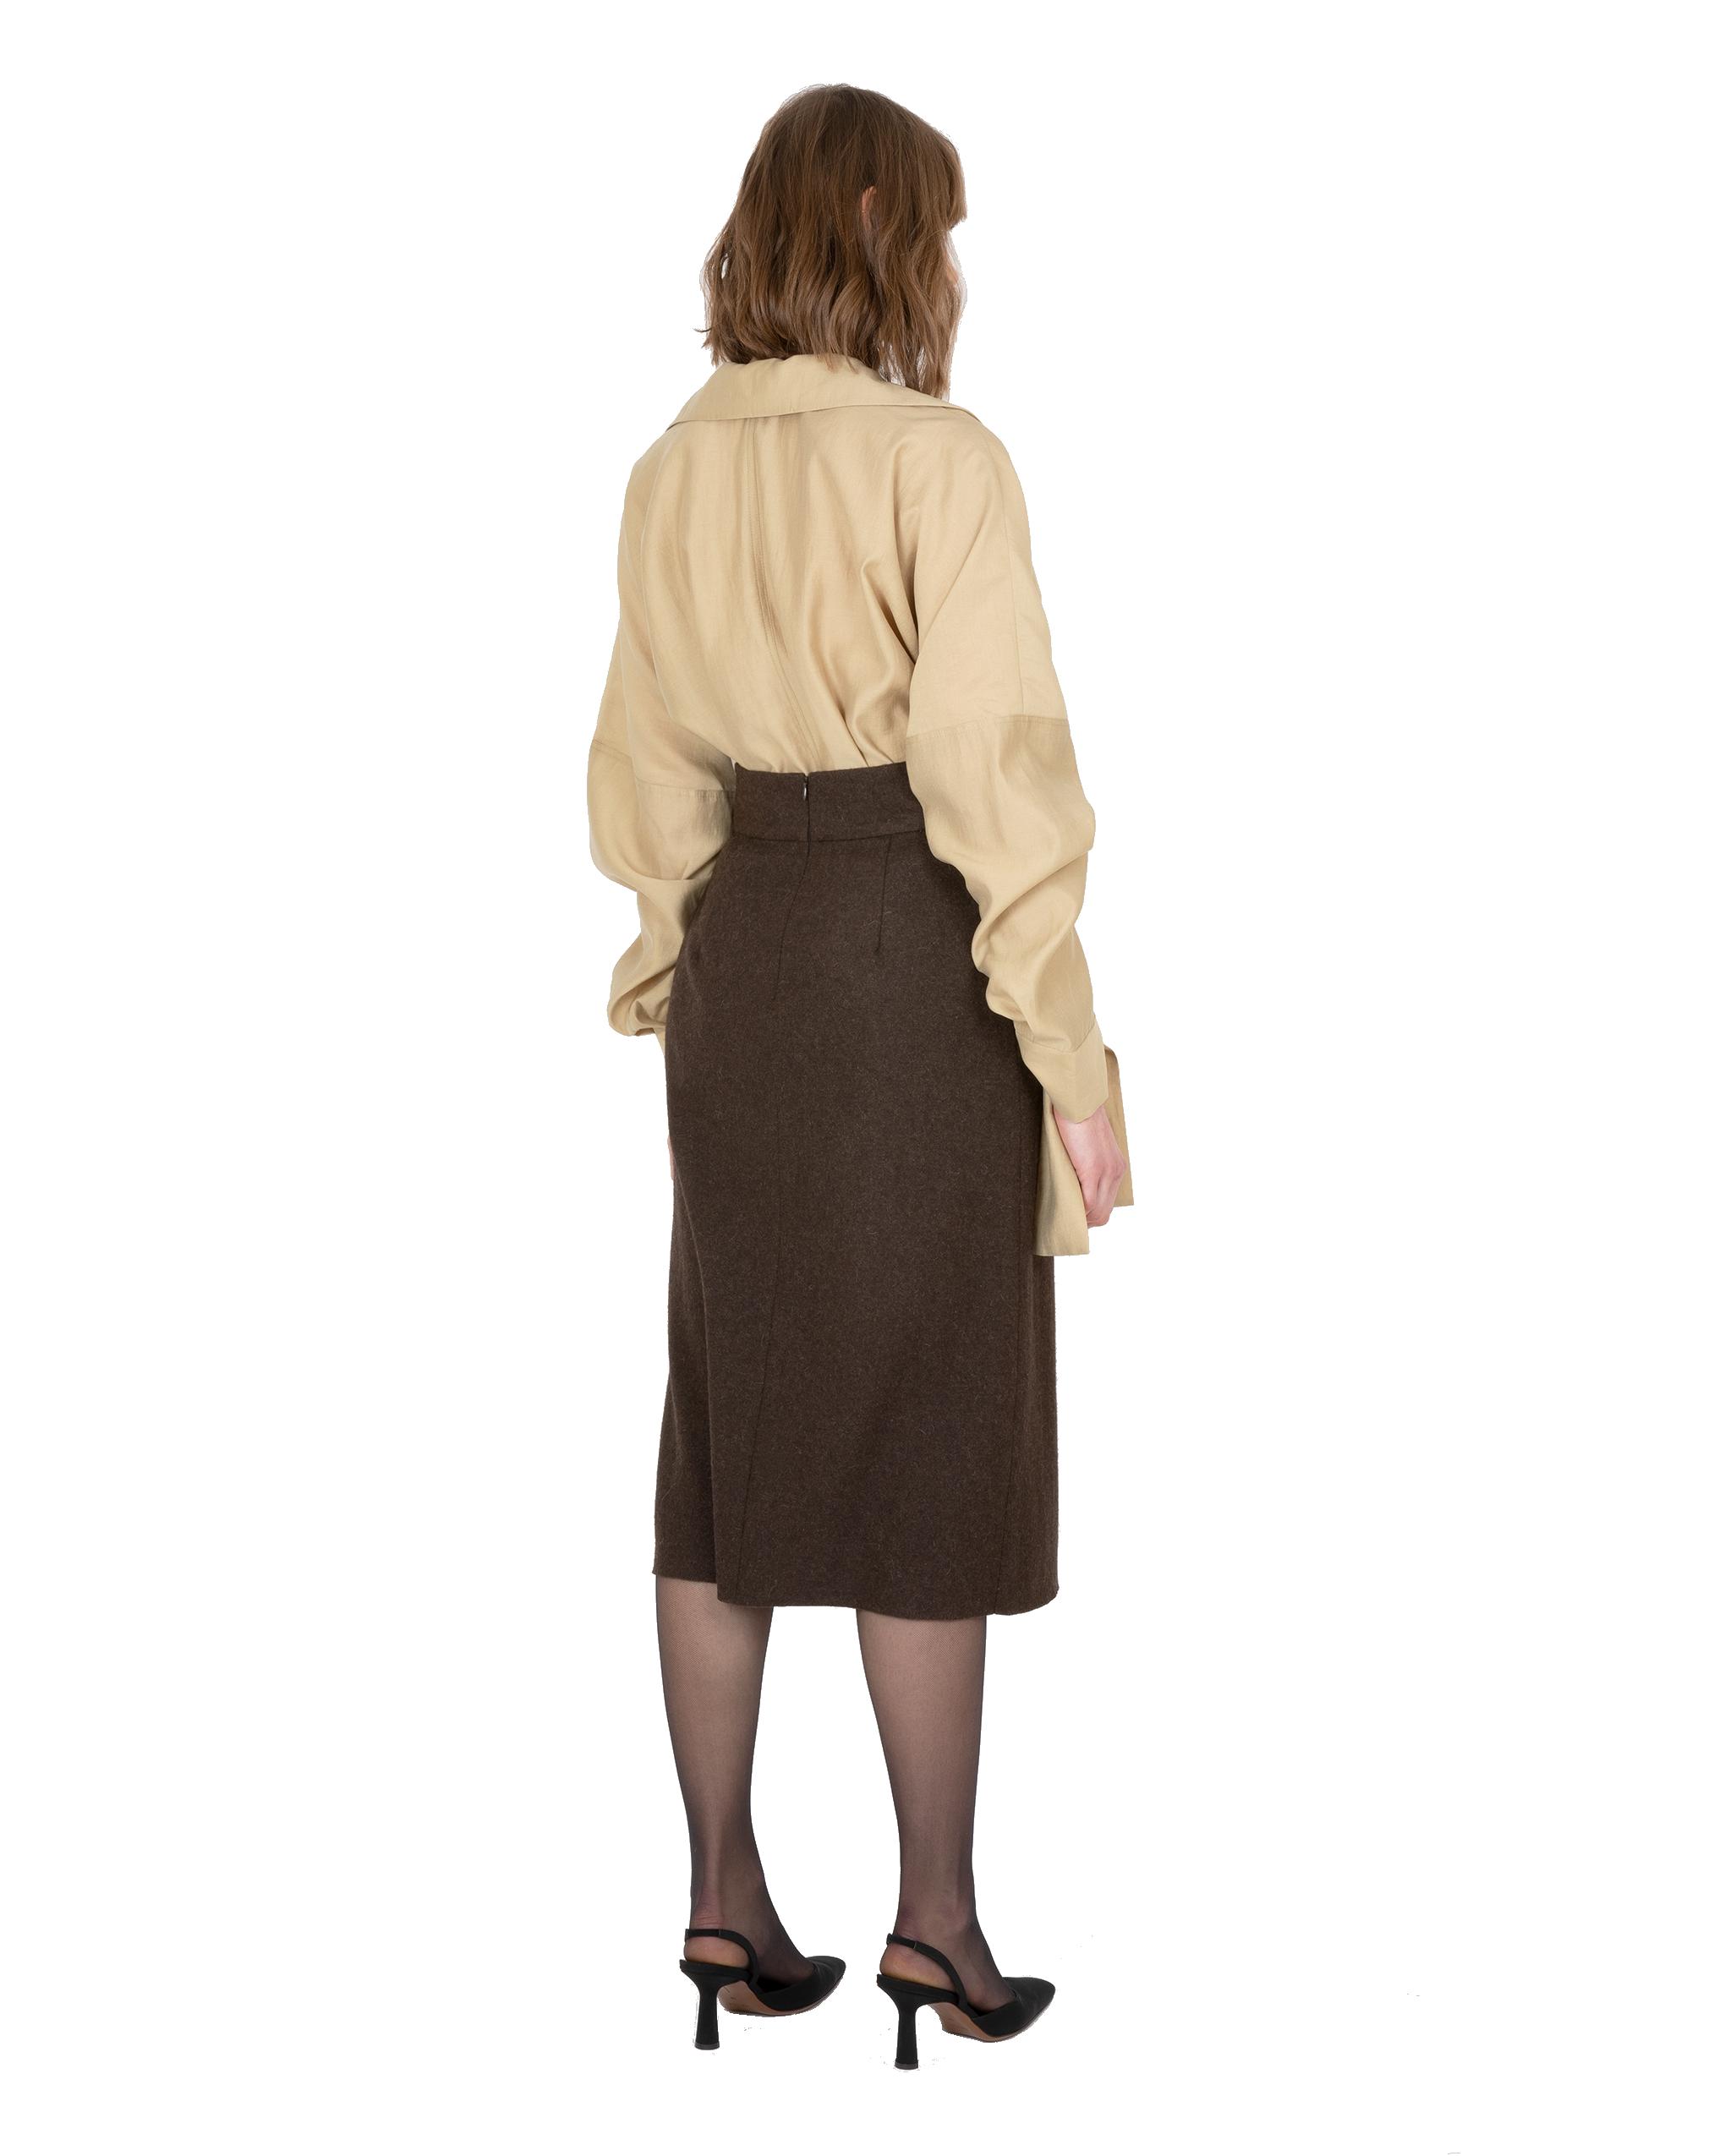 Model wearing EMIN + PAUL khaki ruched sleeve blouse.